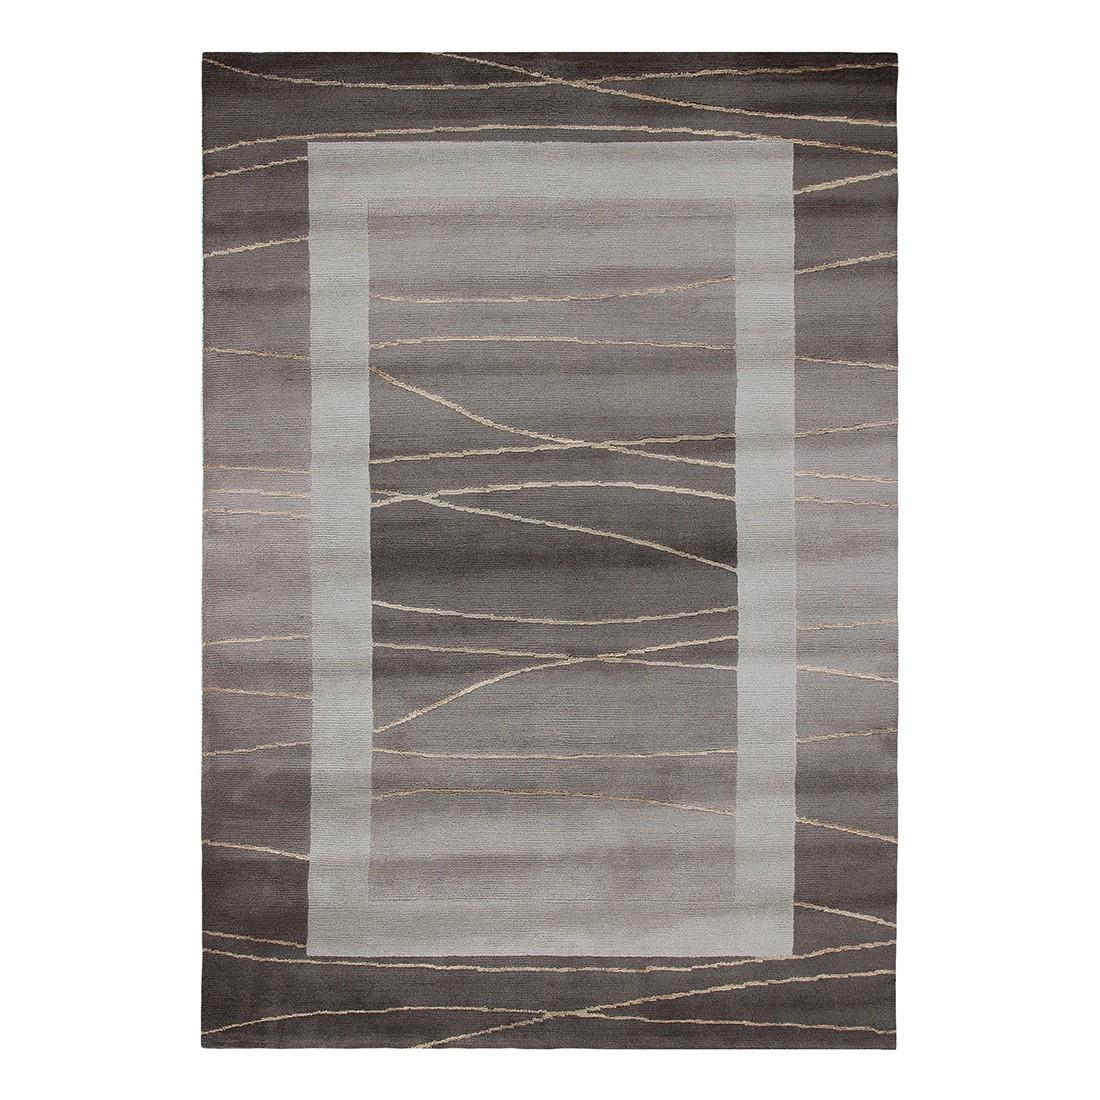 Teppich Linea - Wolle/ Hellbraun - 170 cm x 240 cm, Luxor living